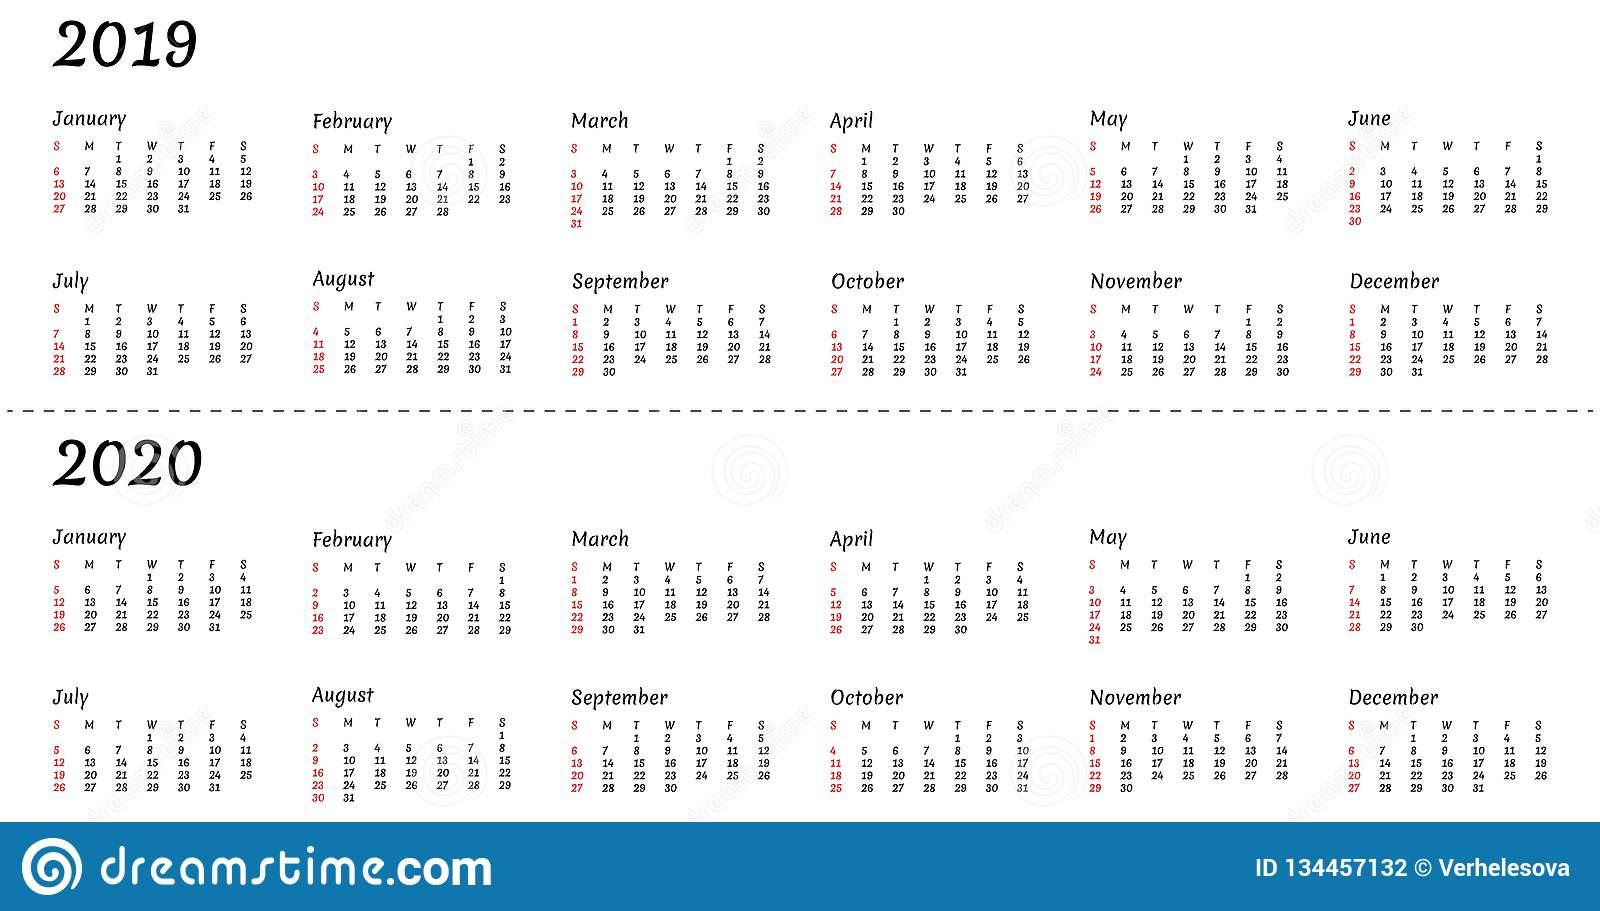 2019 2020 Calendar Year - Vector Illustration. The Week